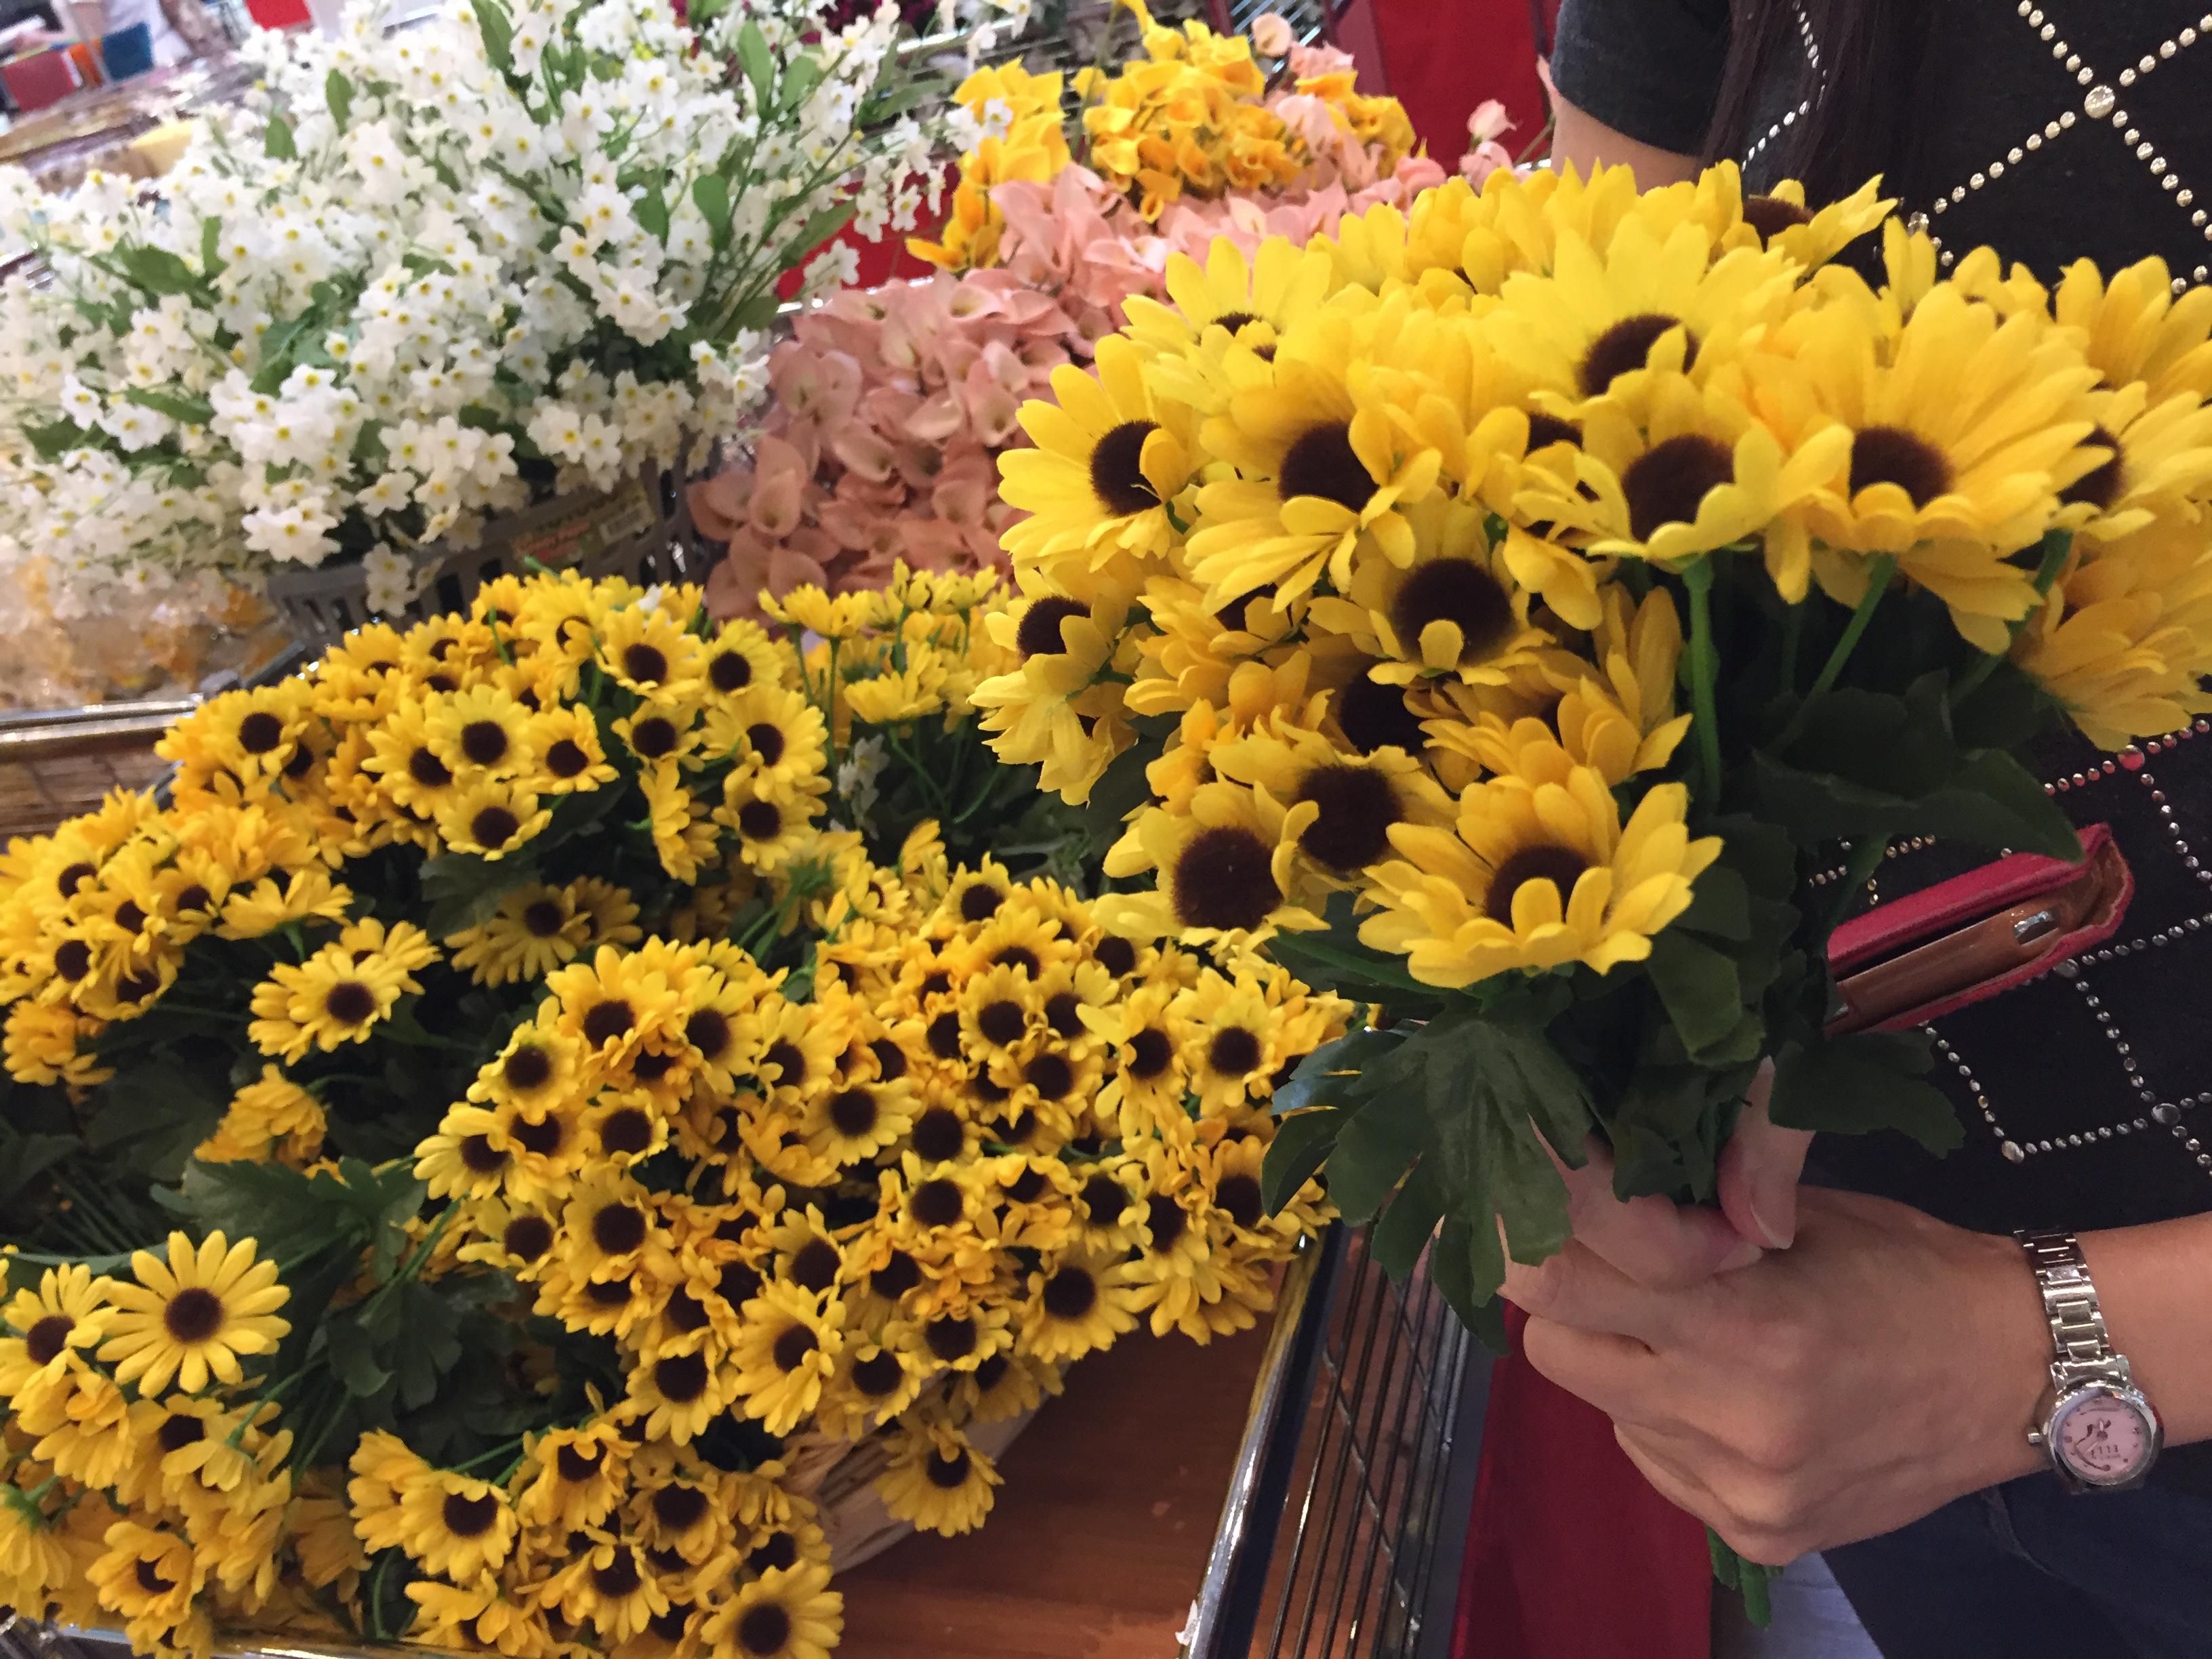 Wifey buys fake daisies again.